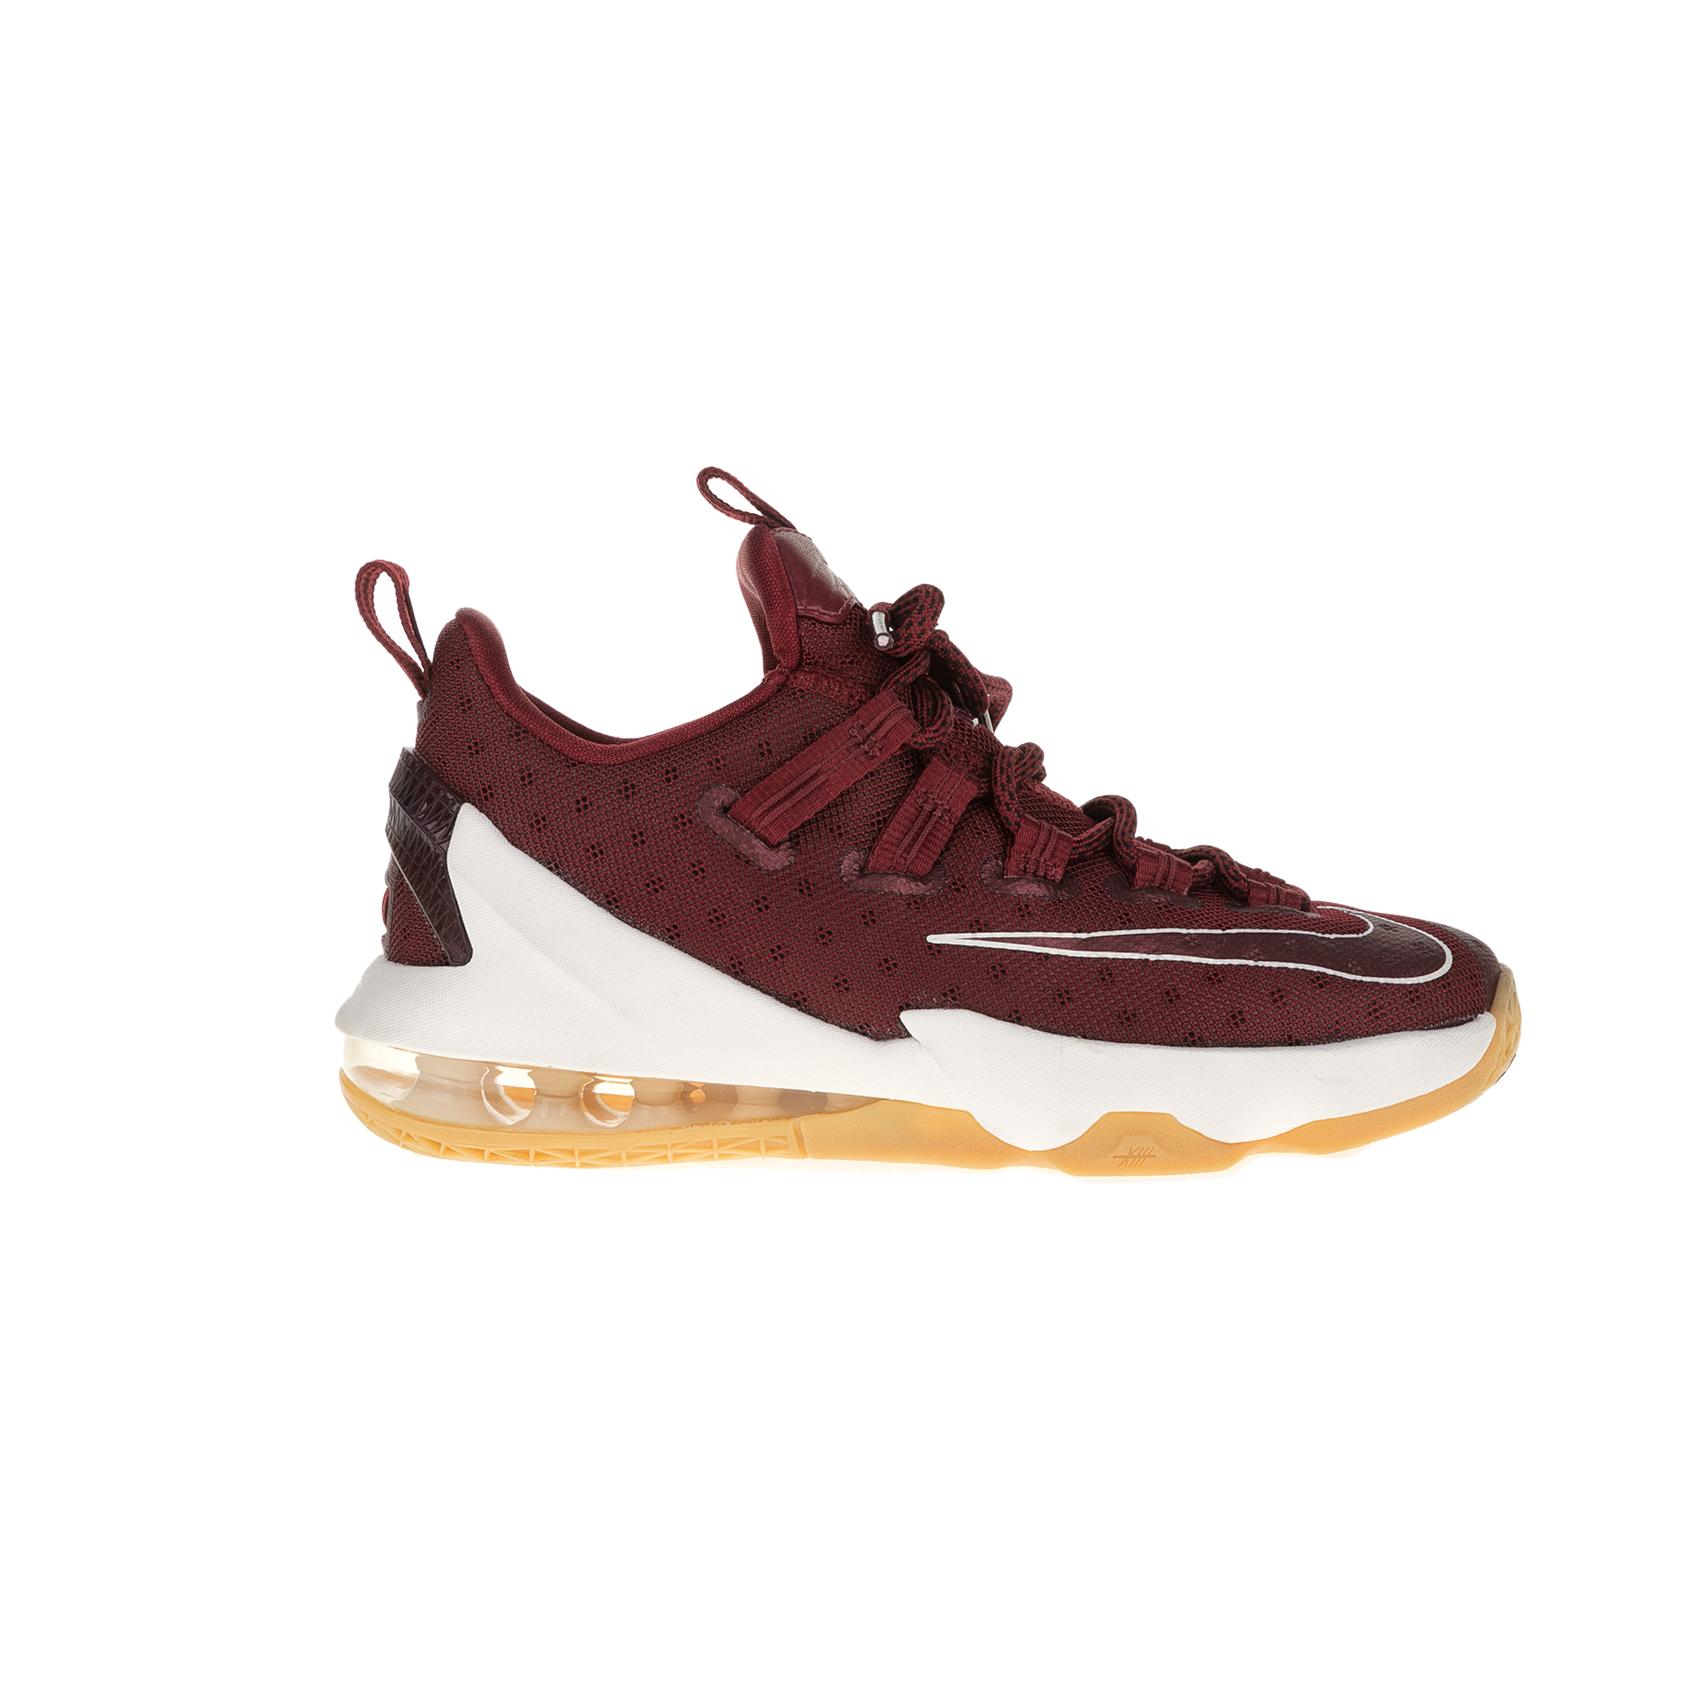 NIKE – Ανδρικά παπούτσια μπάσκετ ΝΙΚΕ LEBRON XIII LOW μπορντό